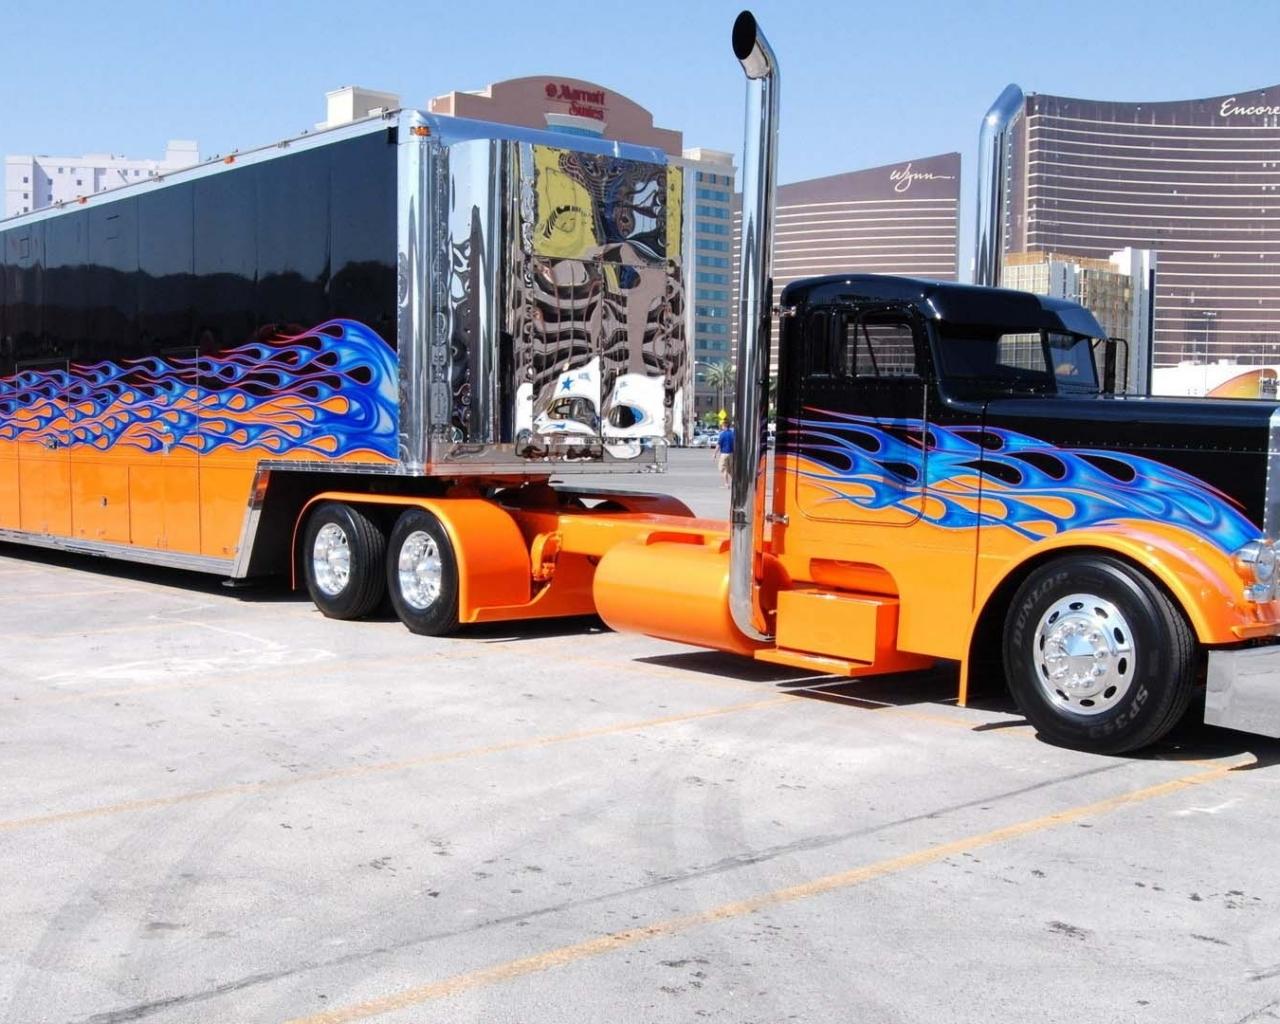 Tunning en camiones - 1280x1024